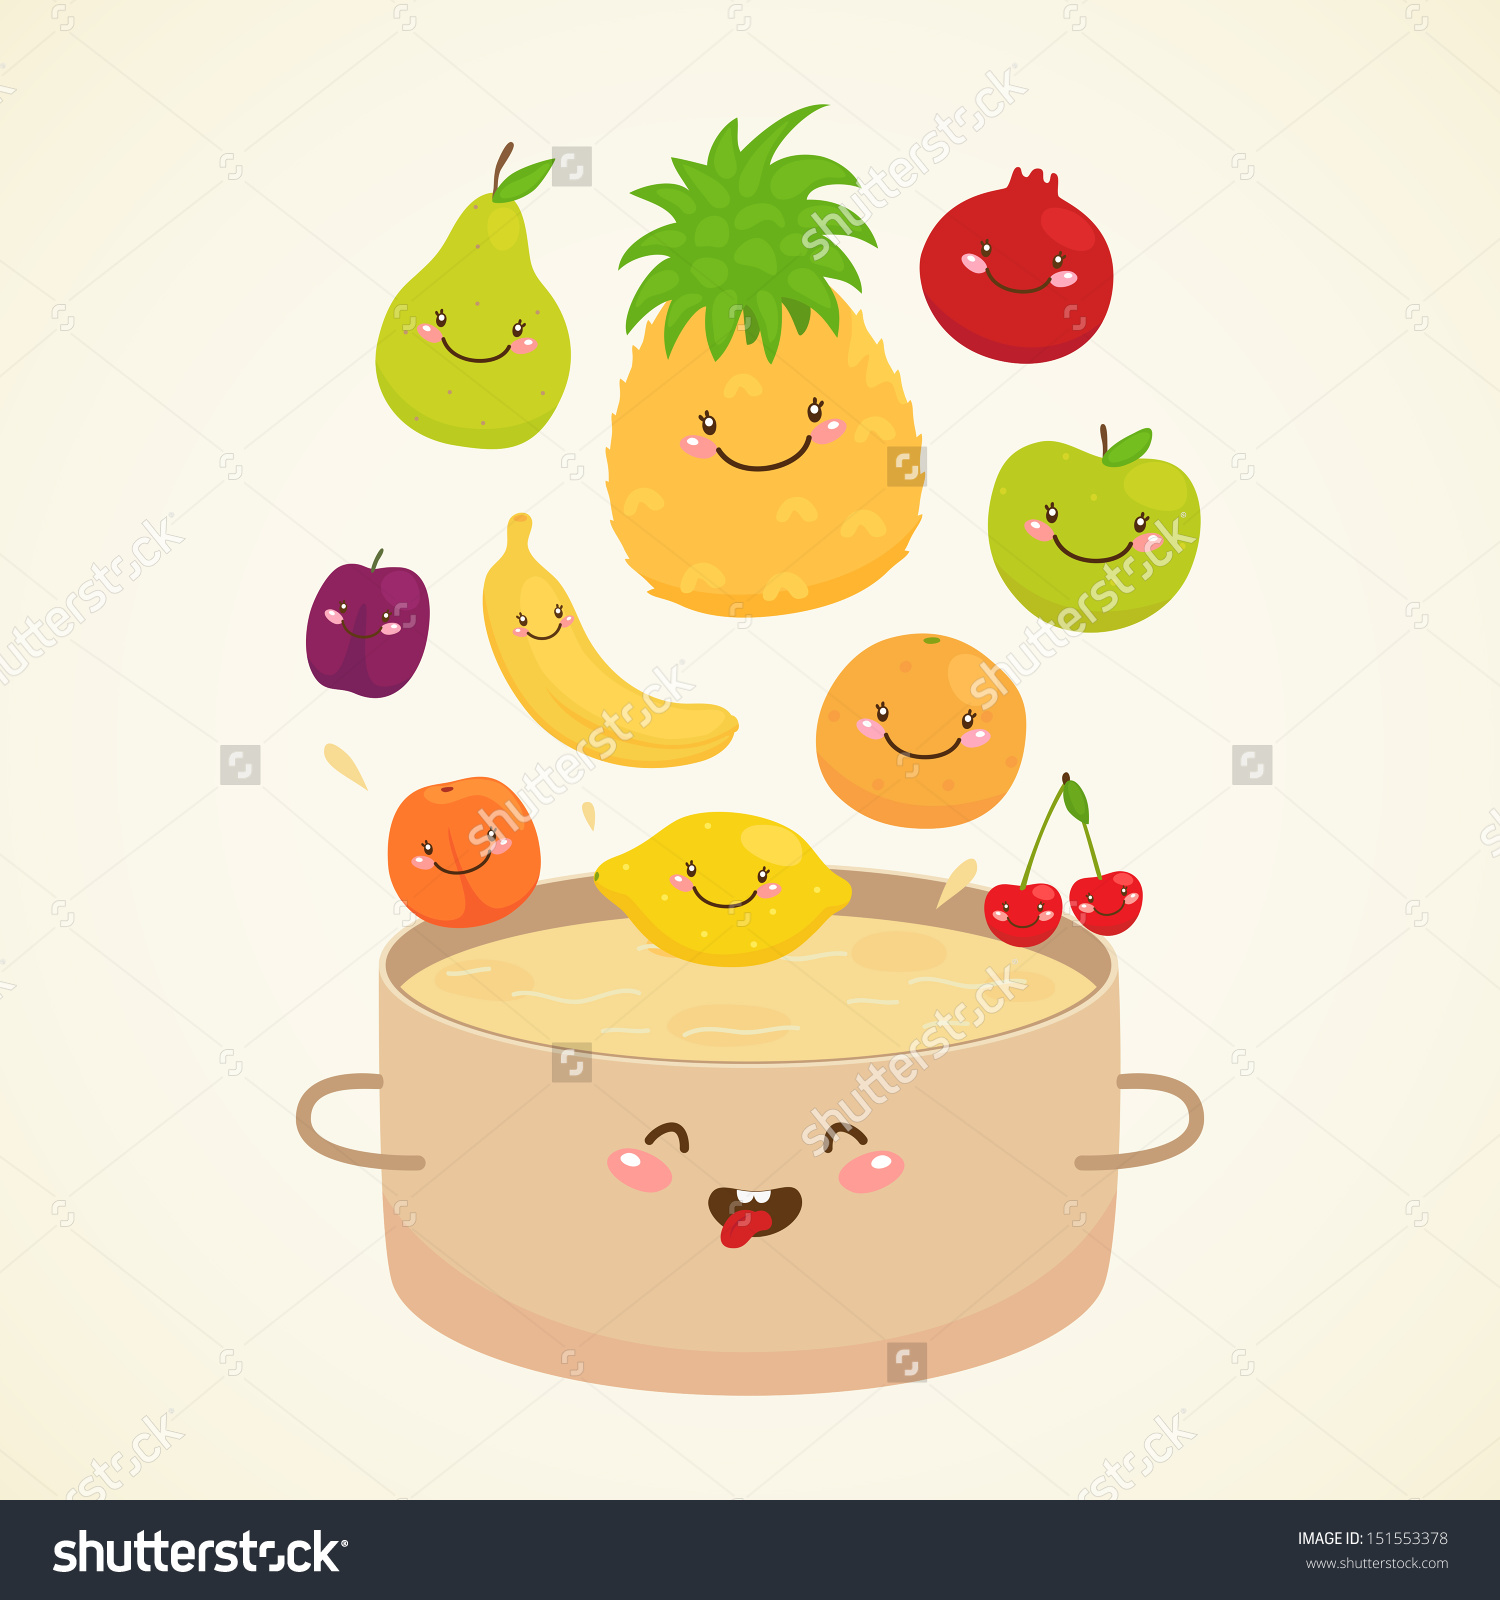 Compote: Apple, Pear, Lemon, Orange, Plum, Cherry, Pineapple.